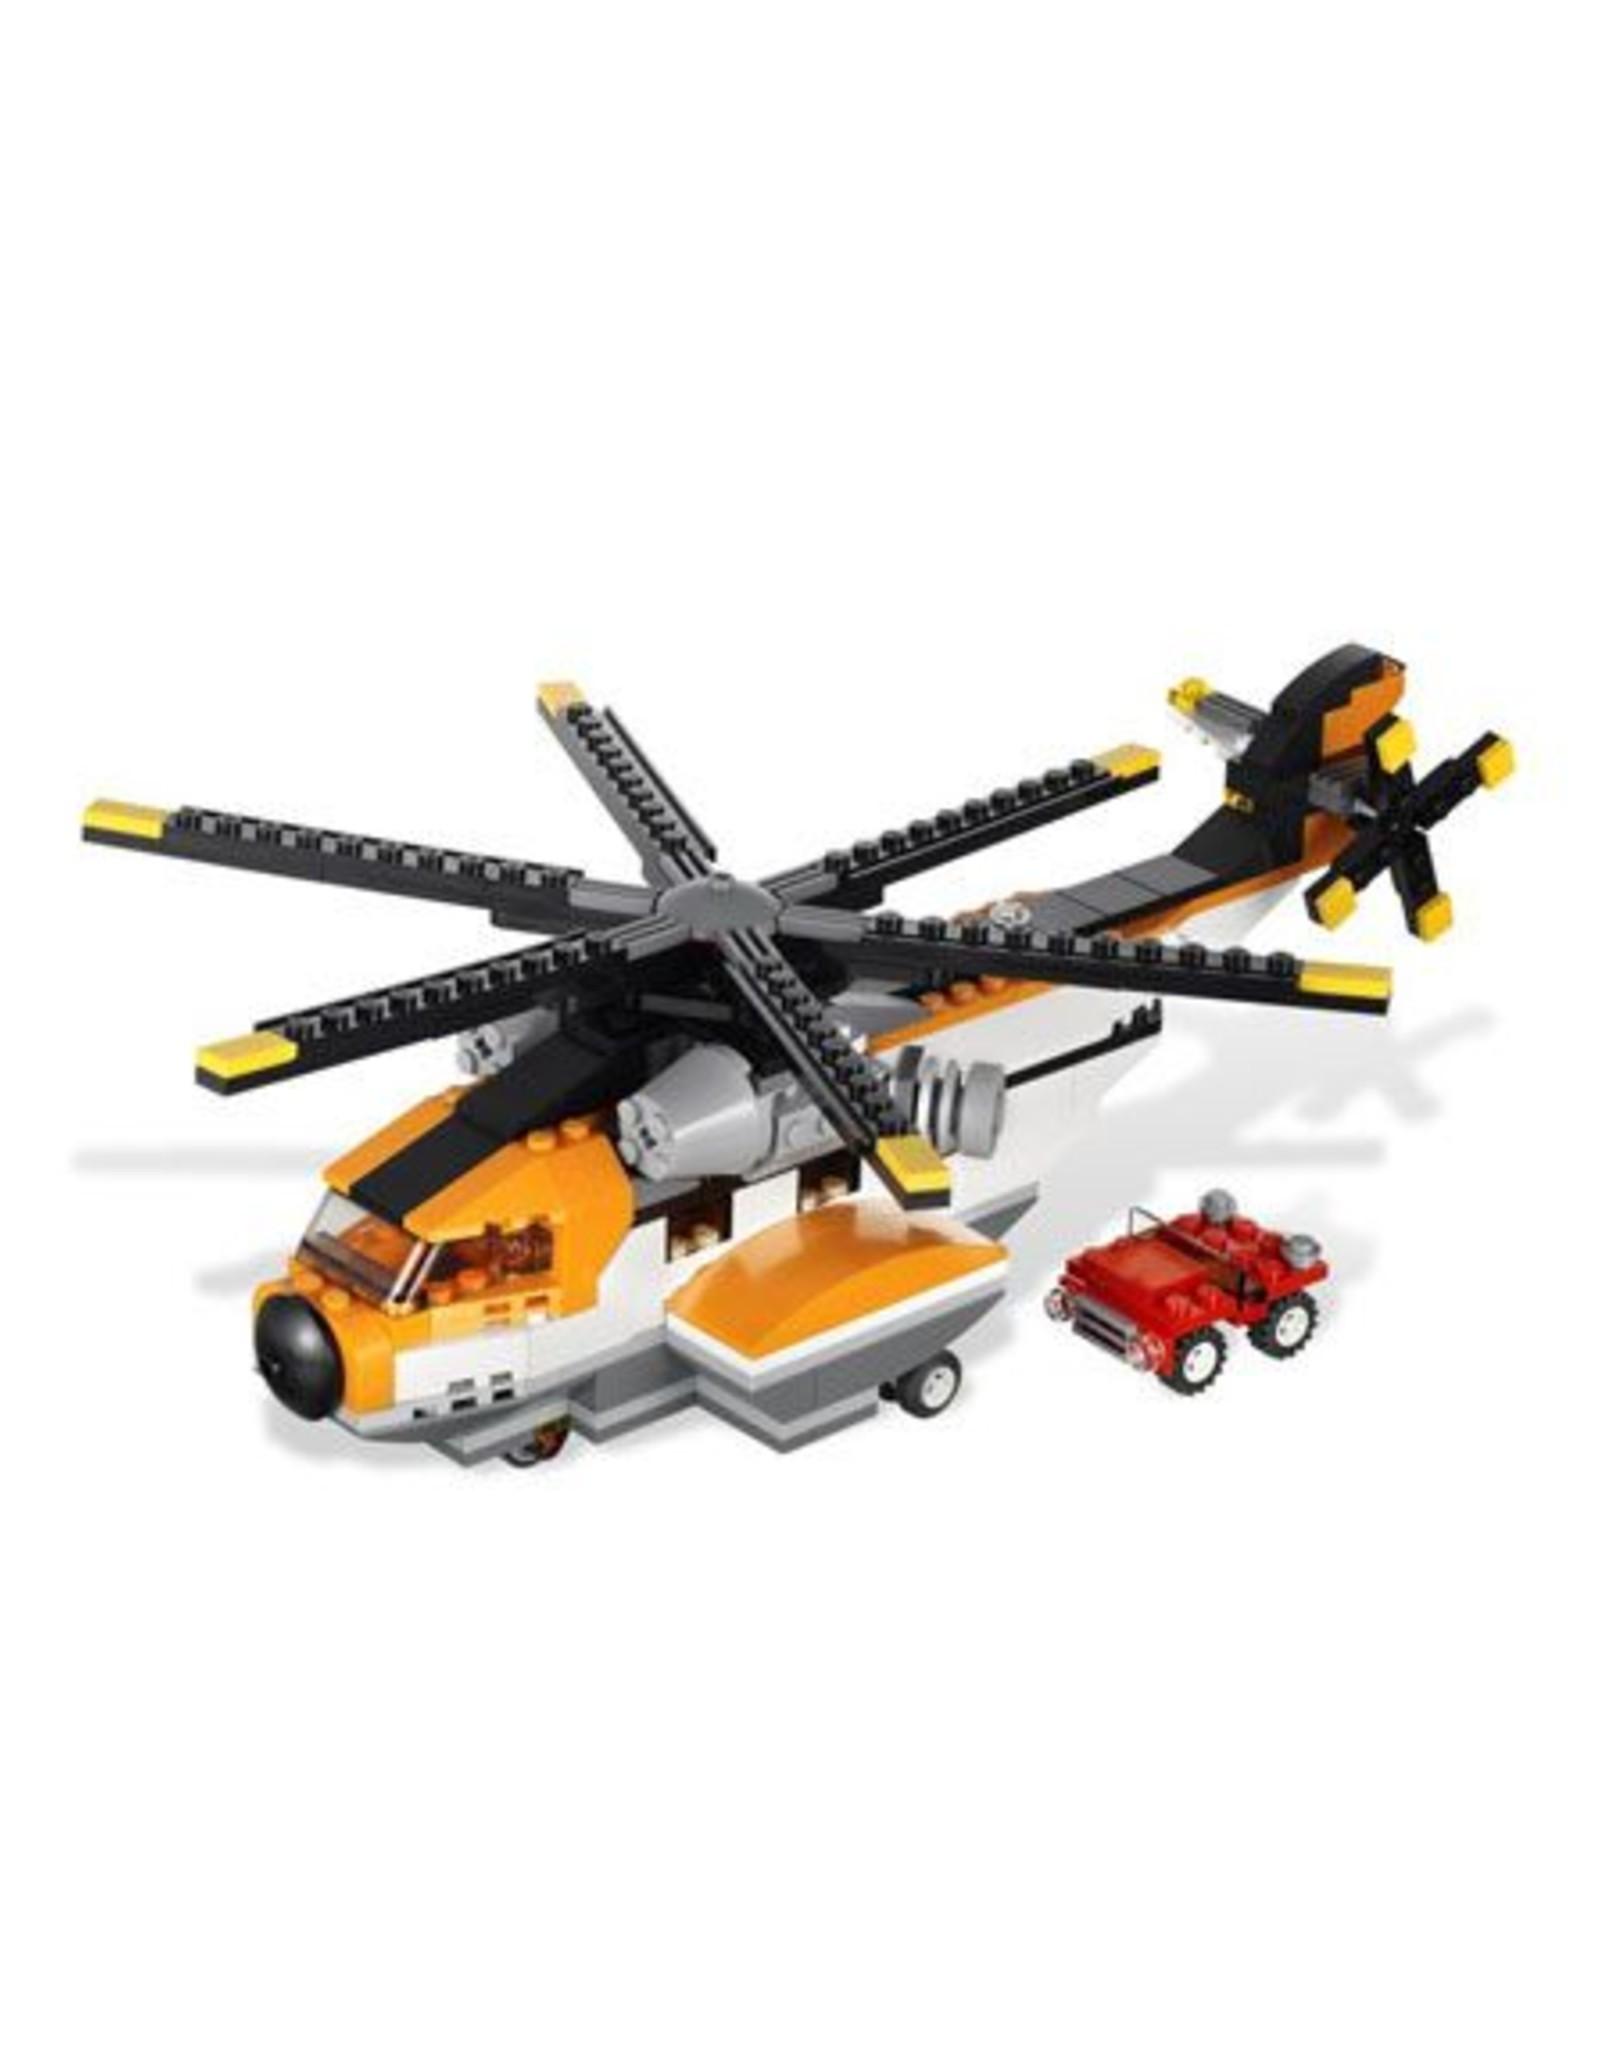 LEGO LEGO 7345 Transport Helicopter CREATOR